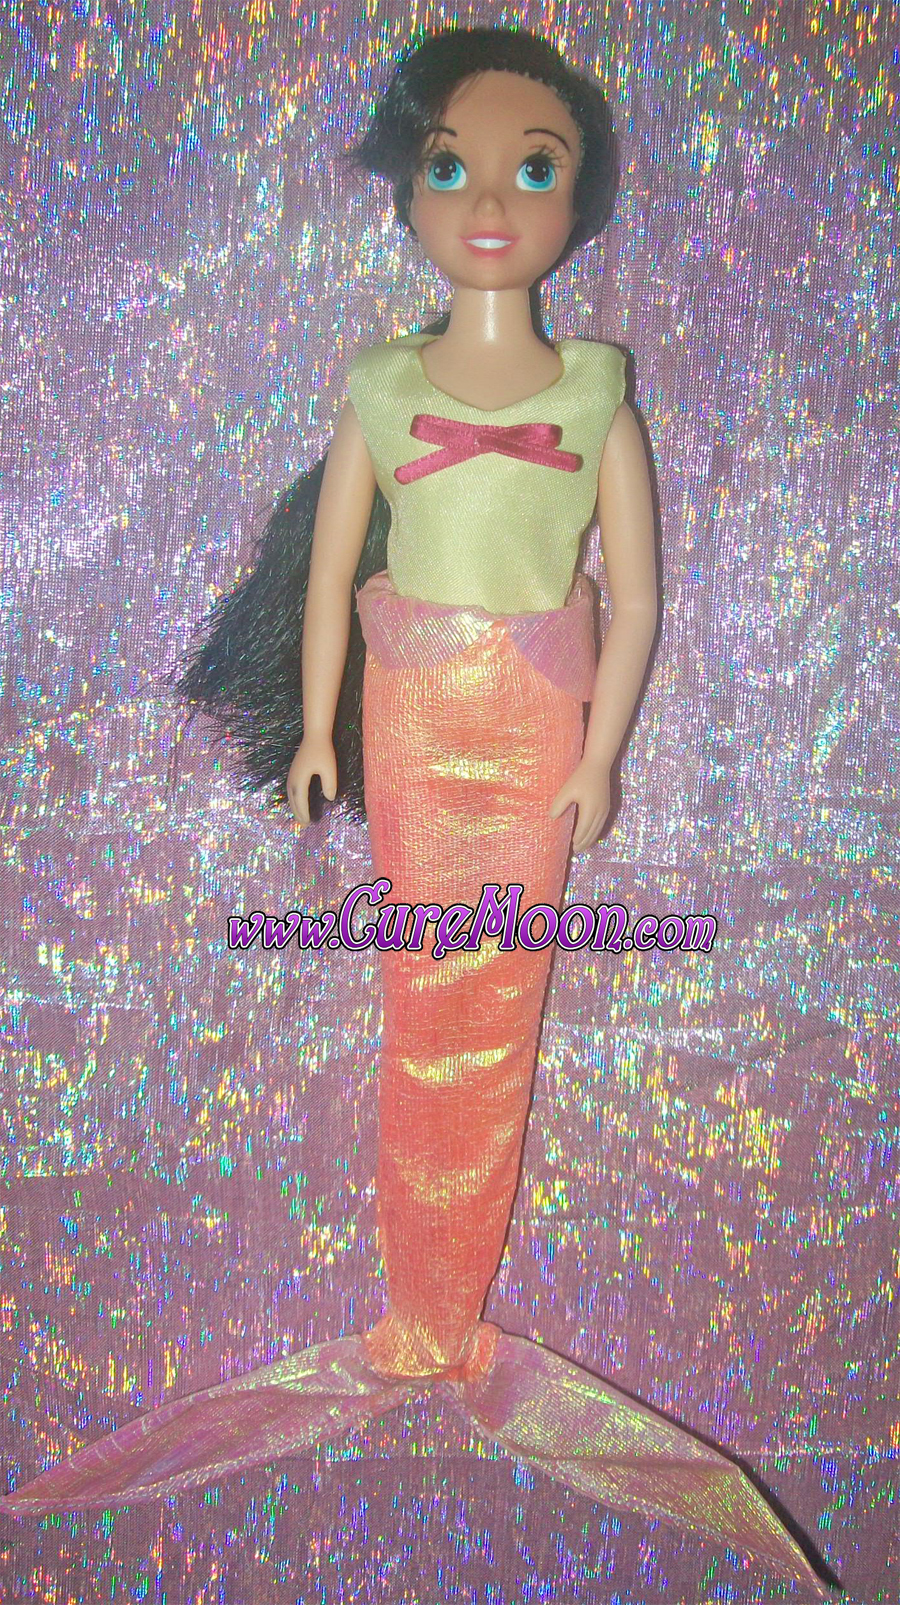 the-little-mermaid-sirenetta-doll-melody-custom-handmade-bambola-disney-curemoon-bunnytsukino